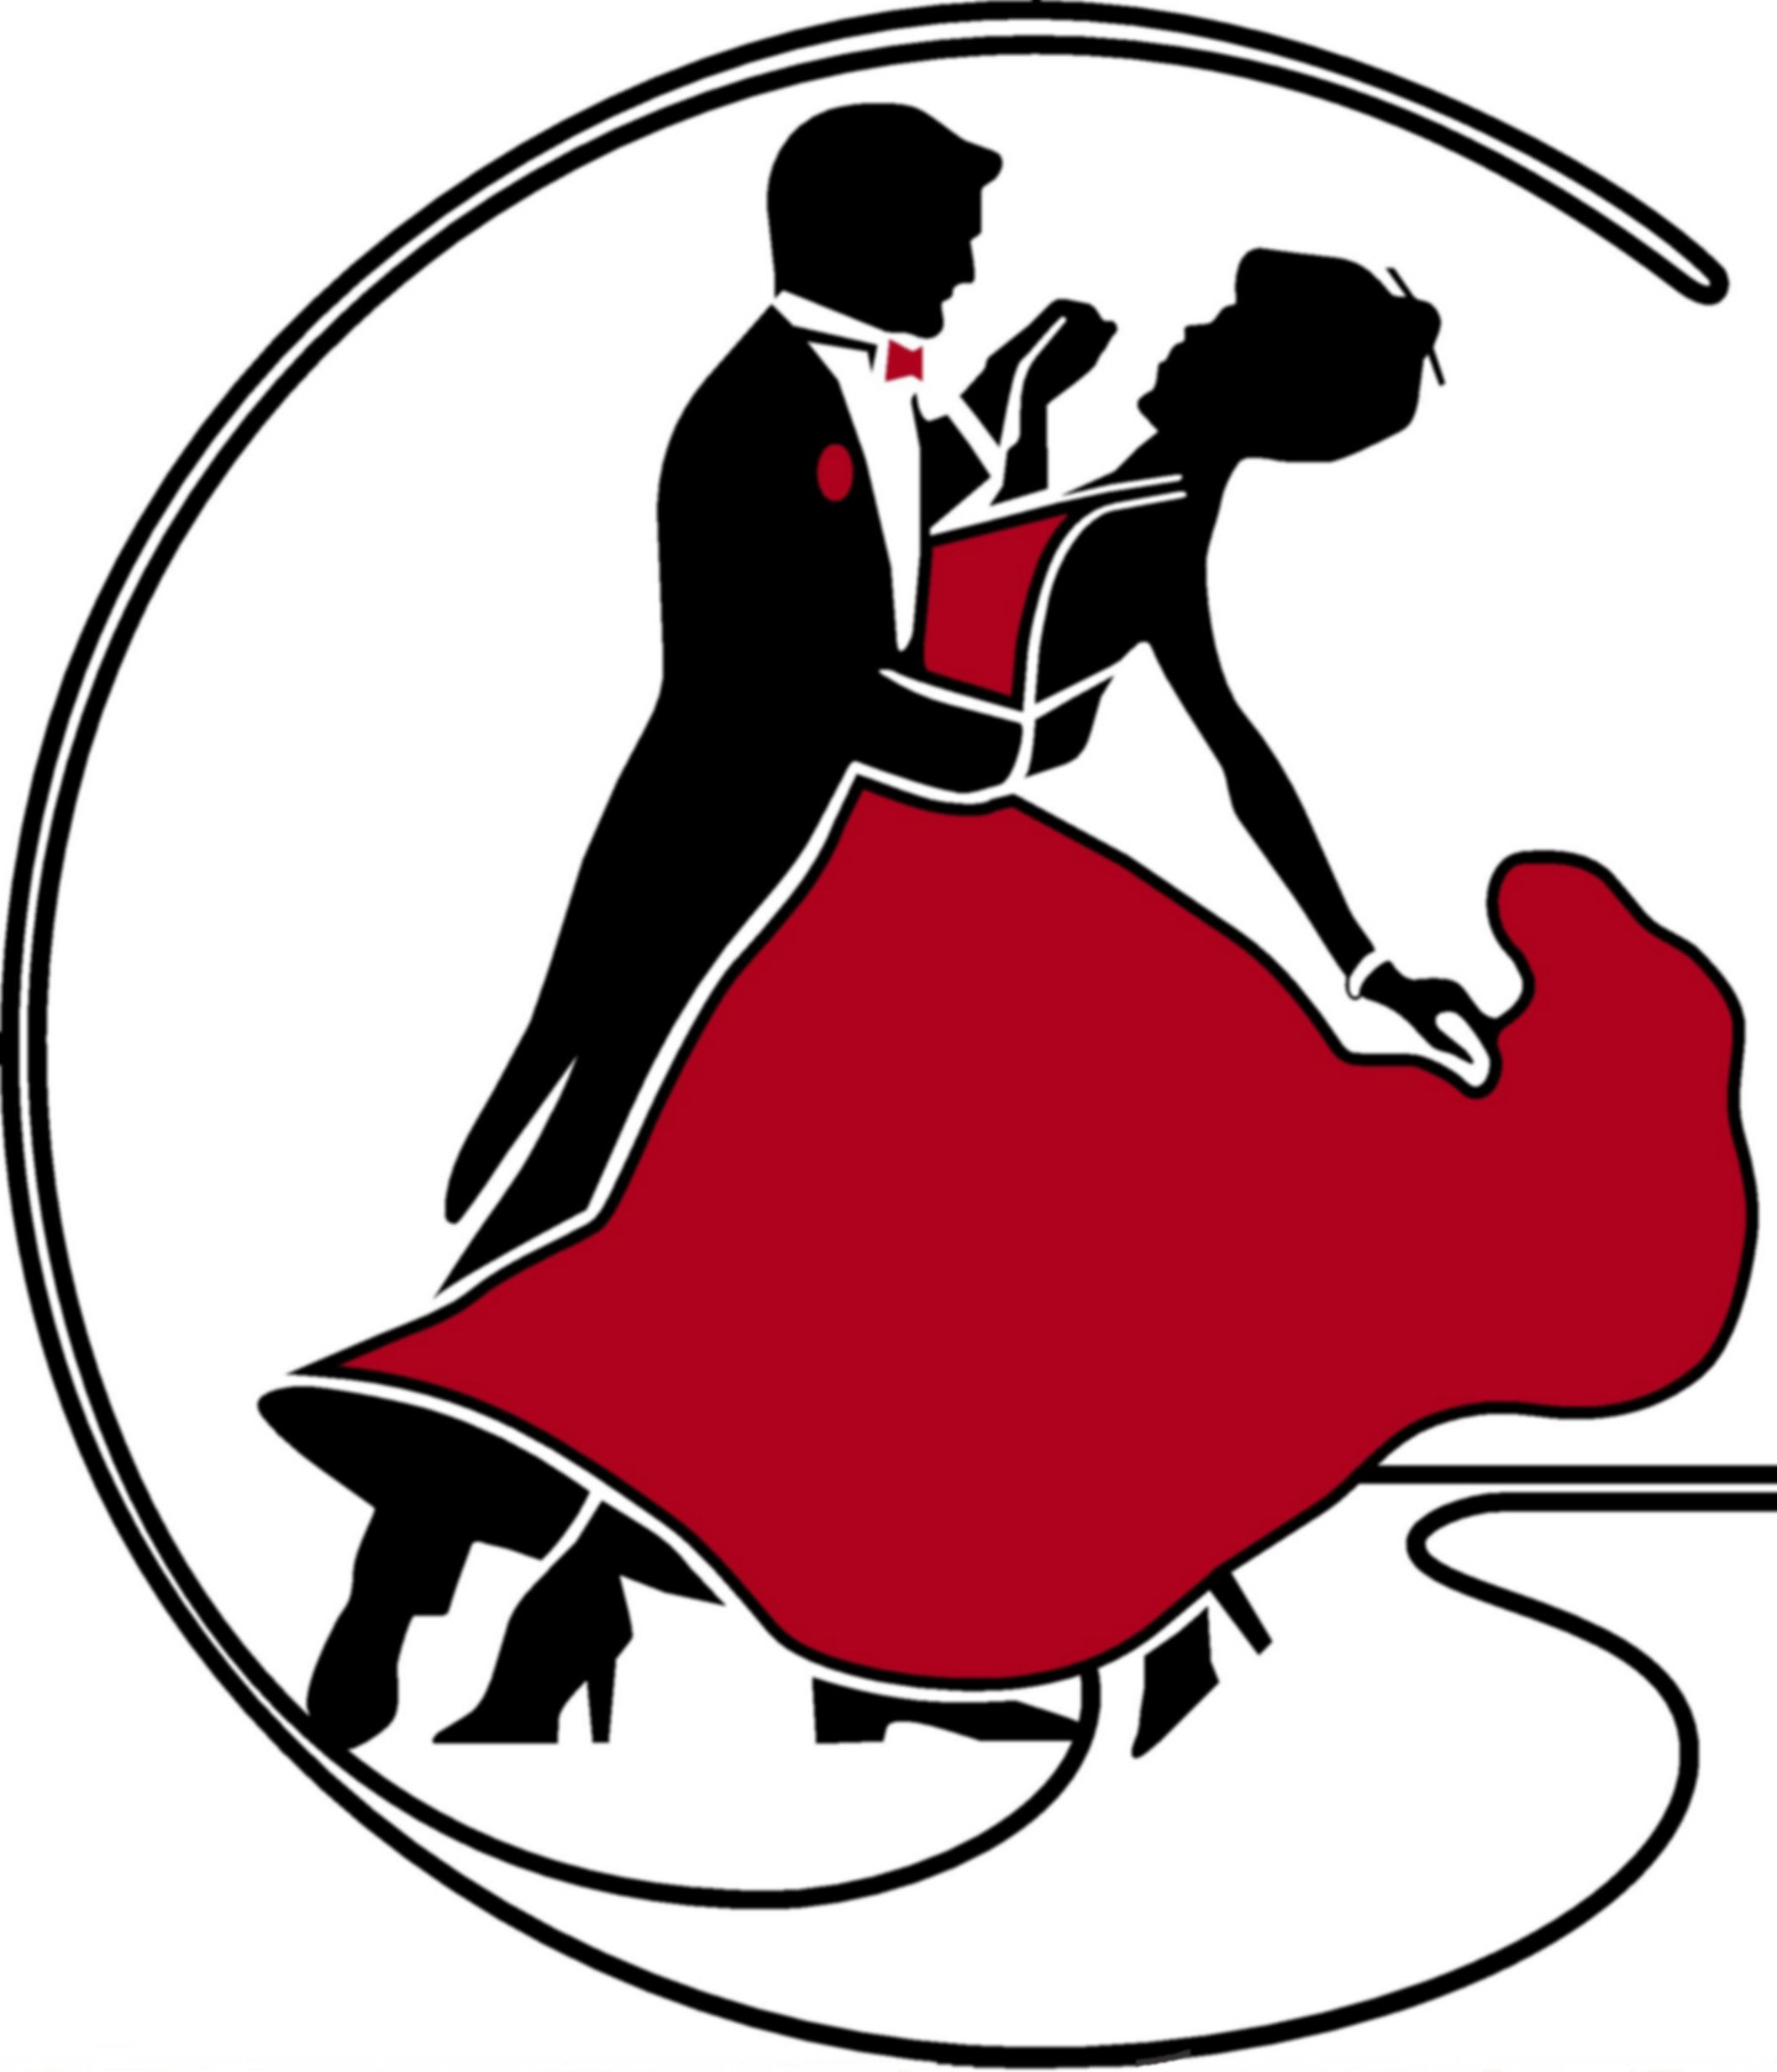 Ballroom Dancing Silhouette Clipart - Clipart Kid